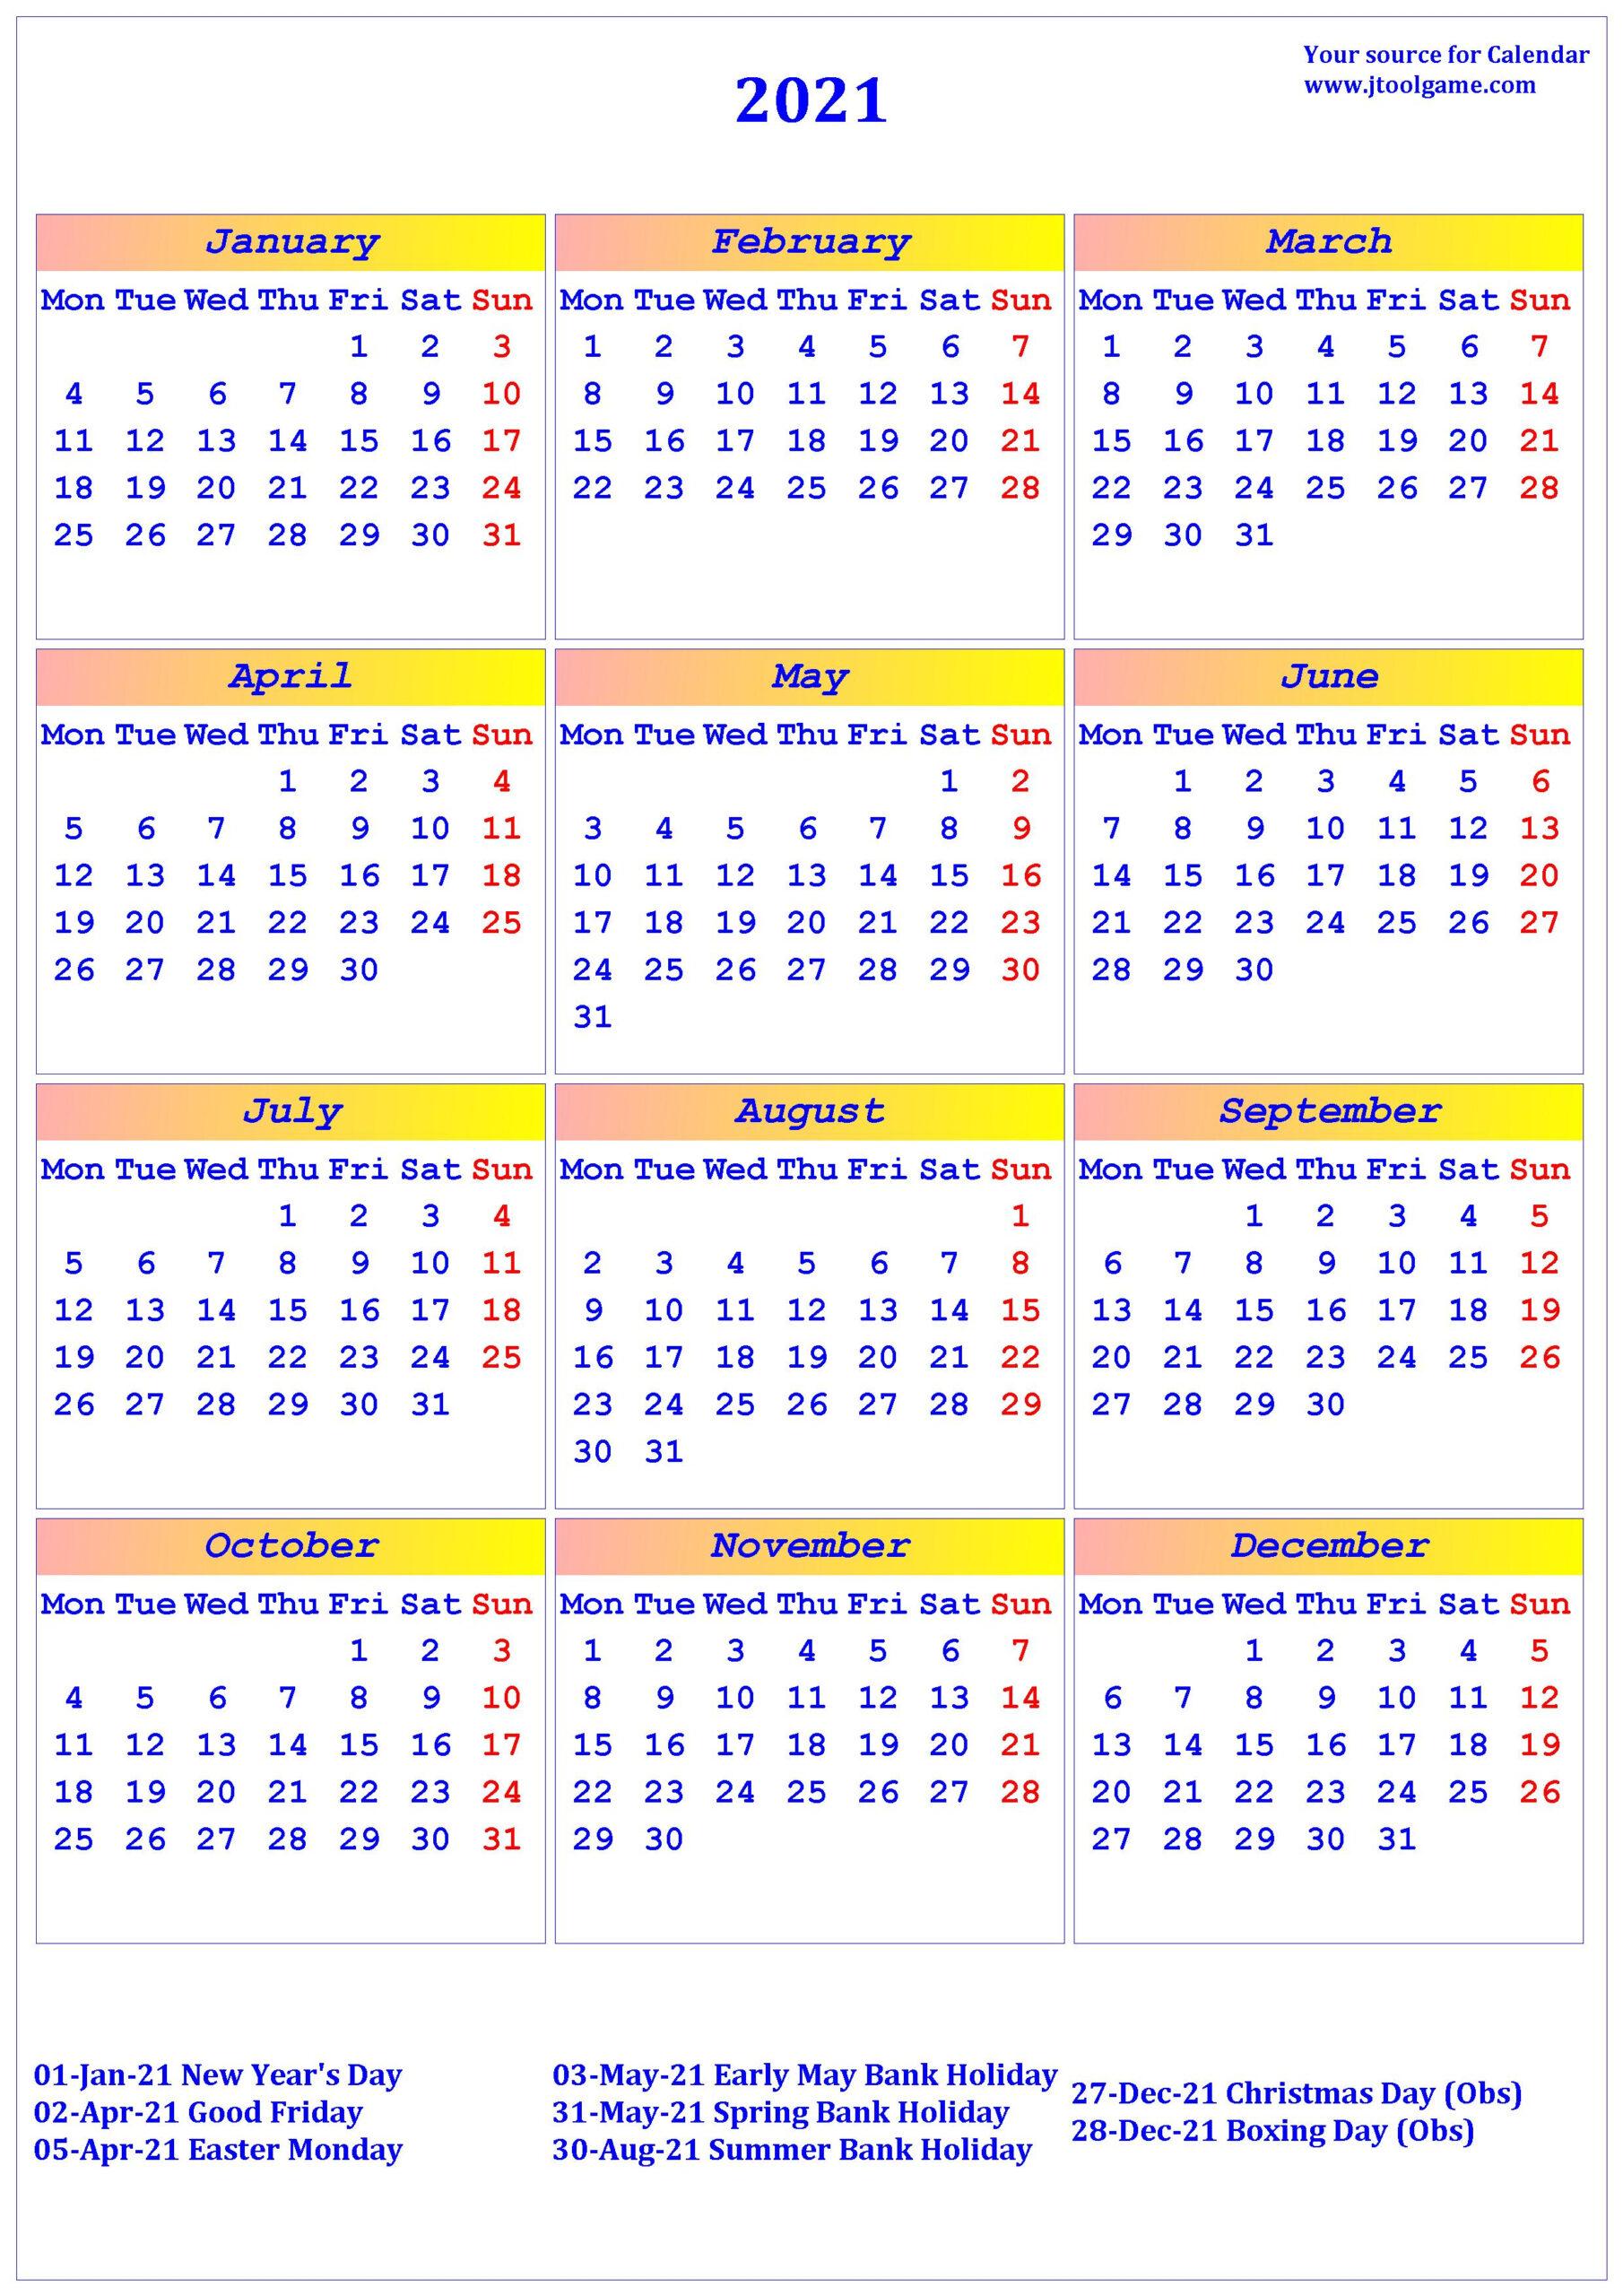 2021 Calendar - Printable Calendar With Usa Holidays in Are Daily Holiday Calendars Copyright